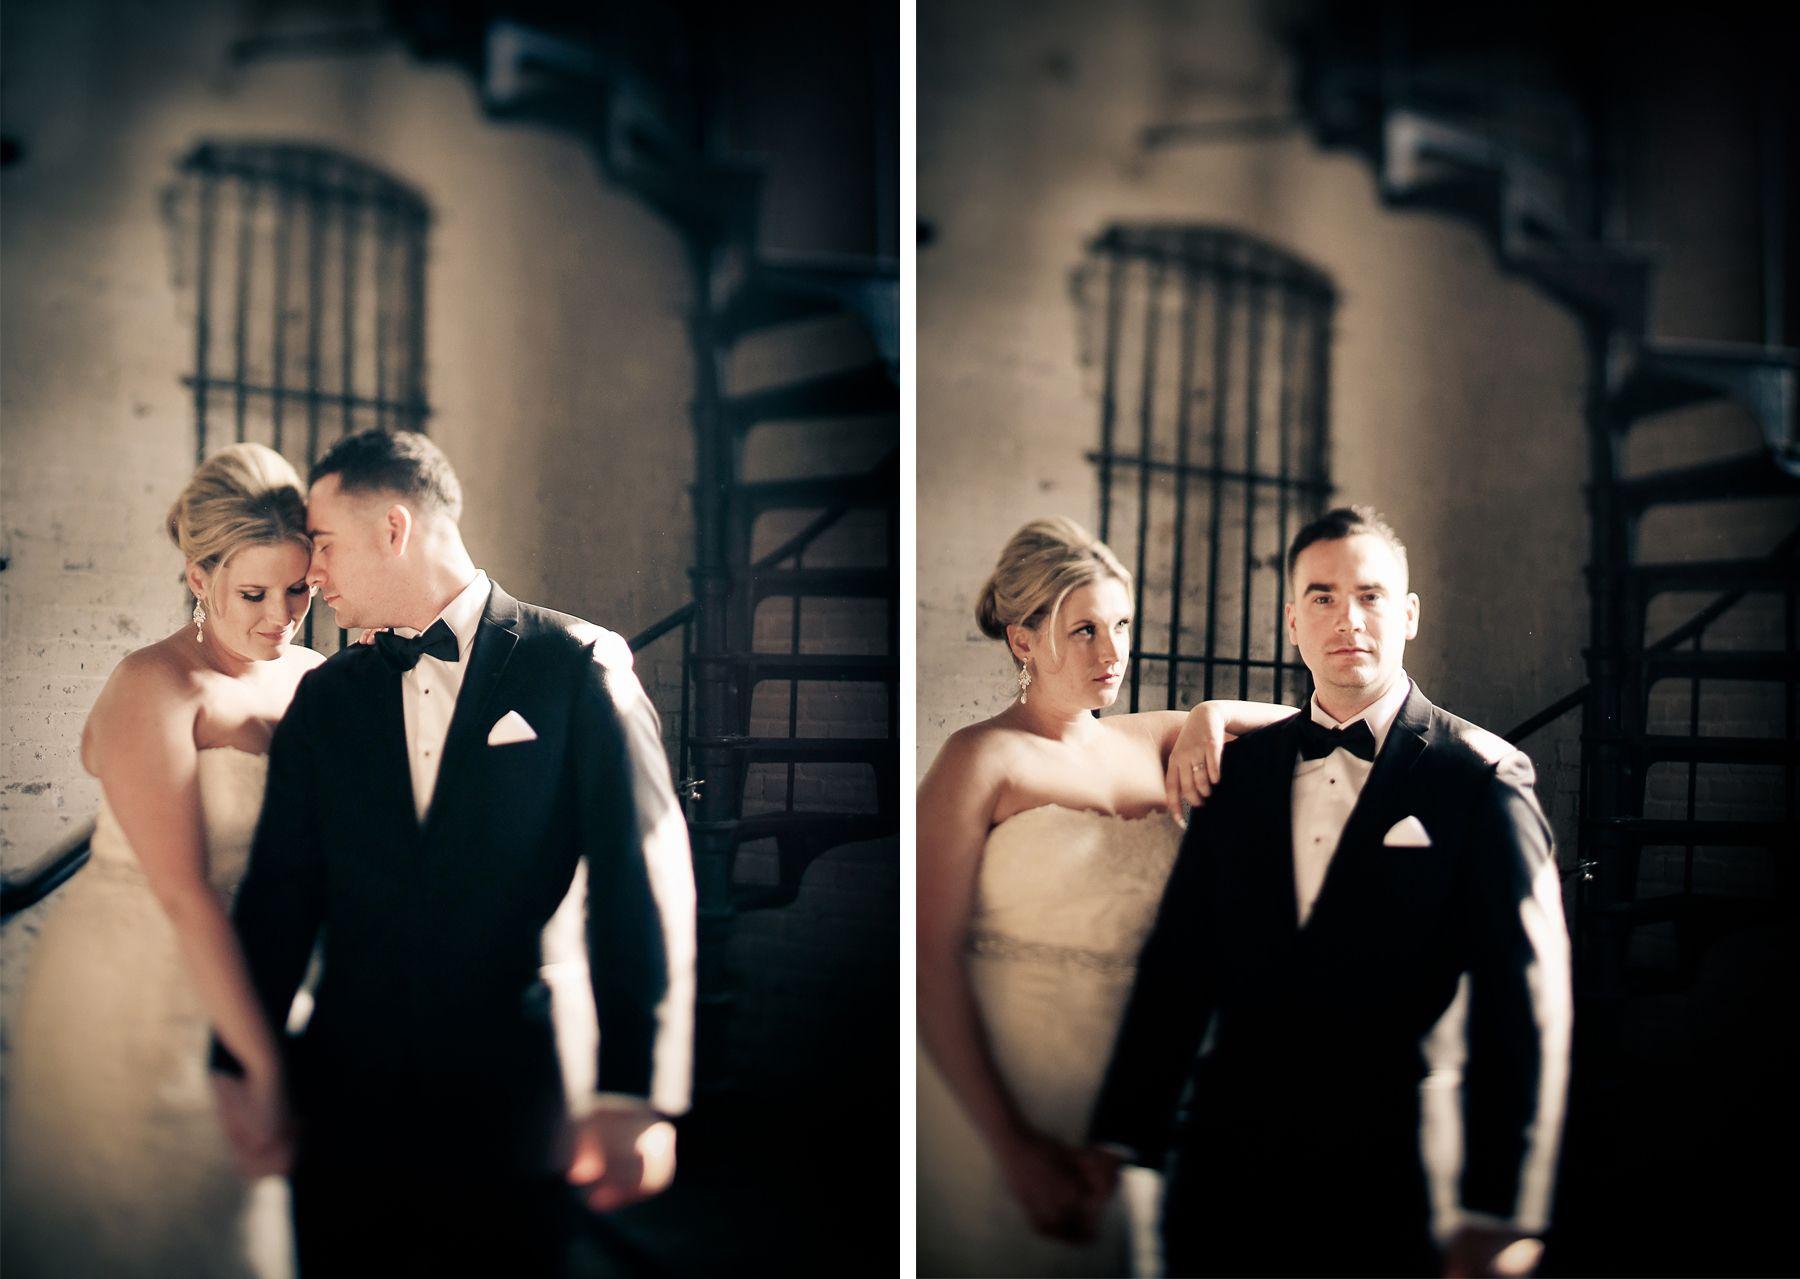 Amy & Devon Groom poses, Photography, Poses